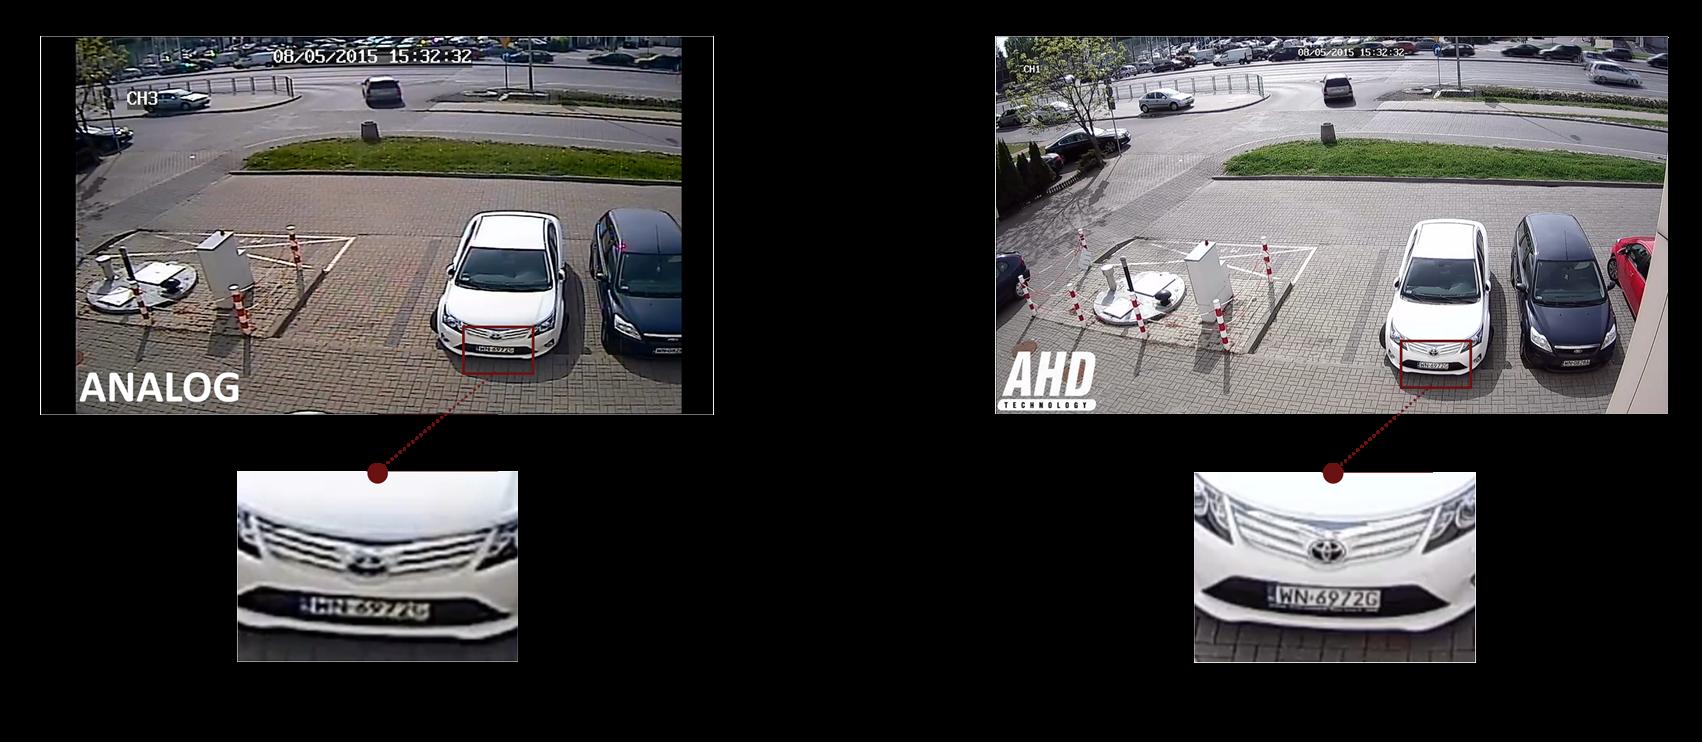 مقایسه دوربین مداربسته ahd با دوربین مداربسته آنالوگ